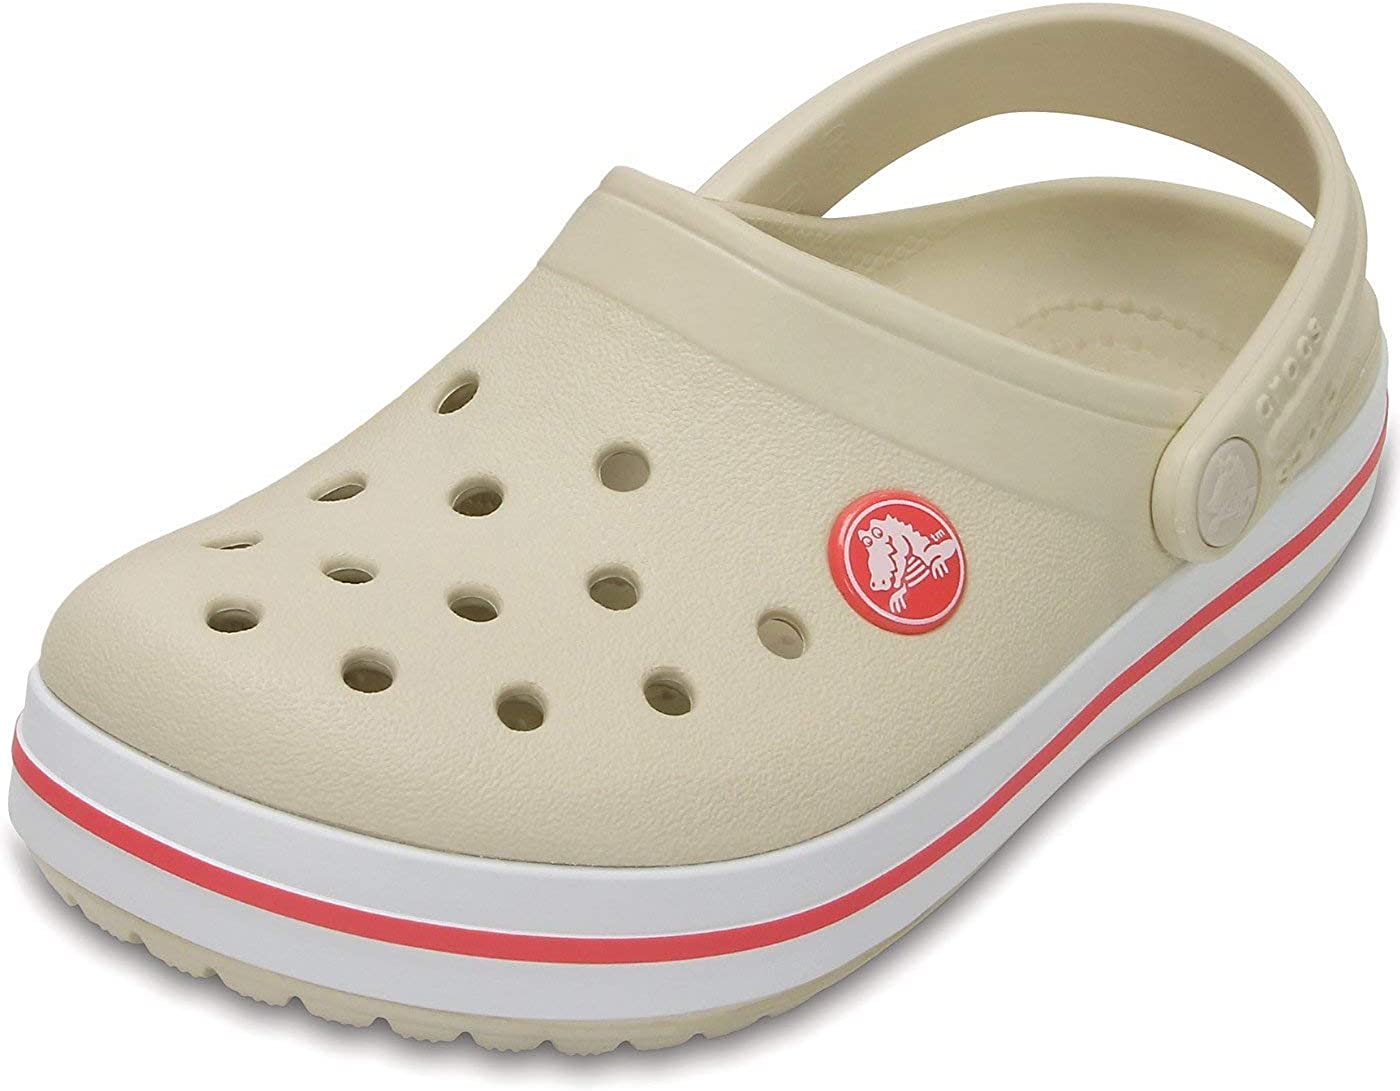 New Crocs Crocband Clogs Shoes Kids Boys Girls SZ 10//11 Smoke /& Navy